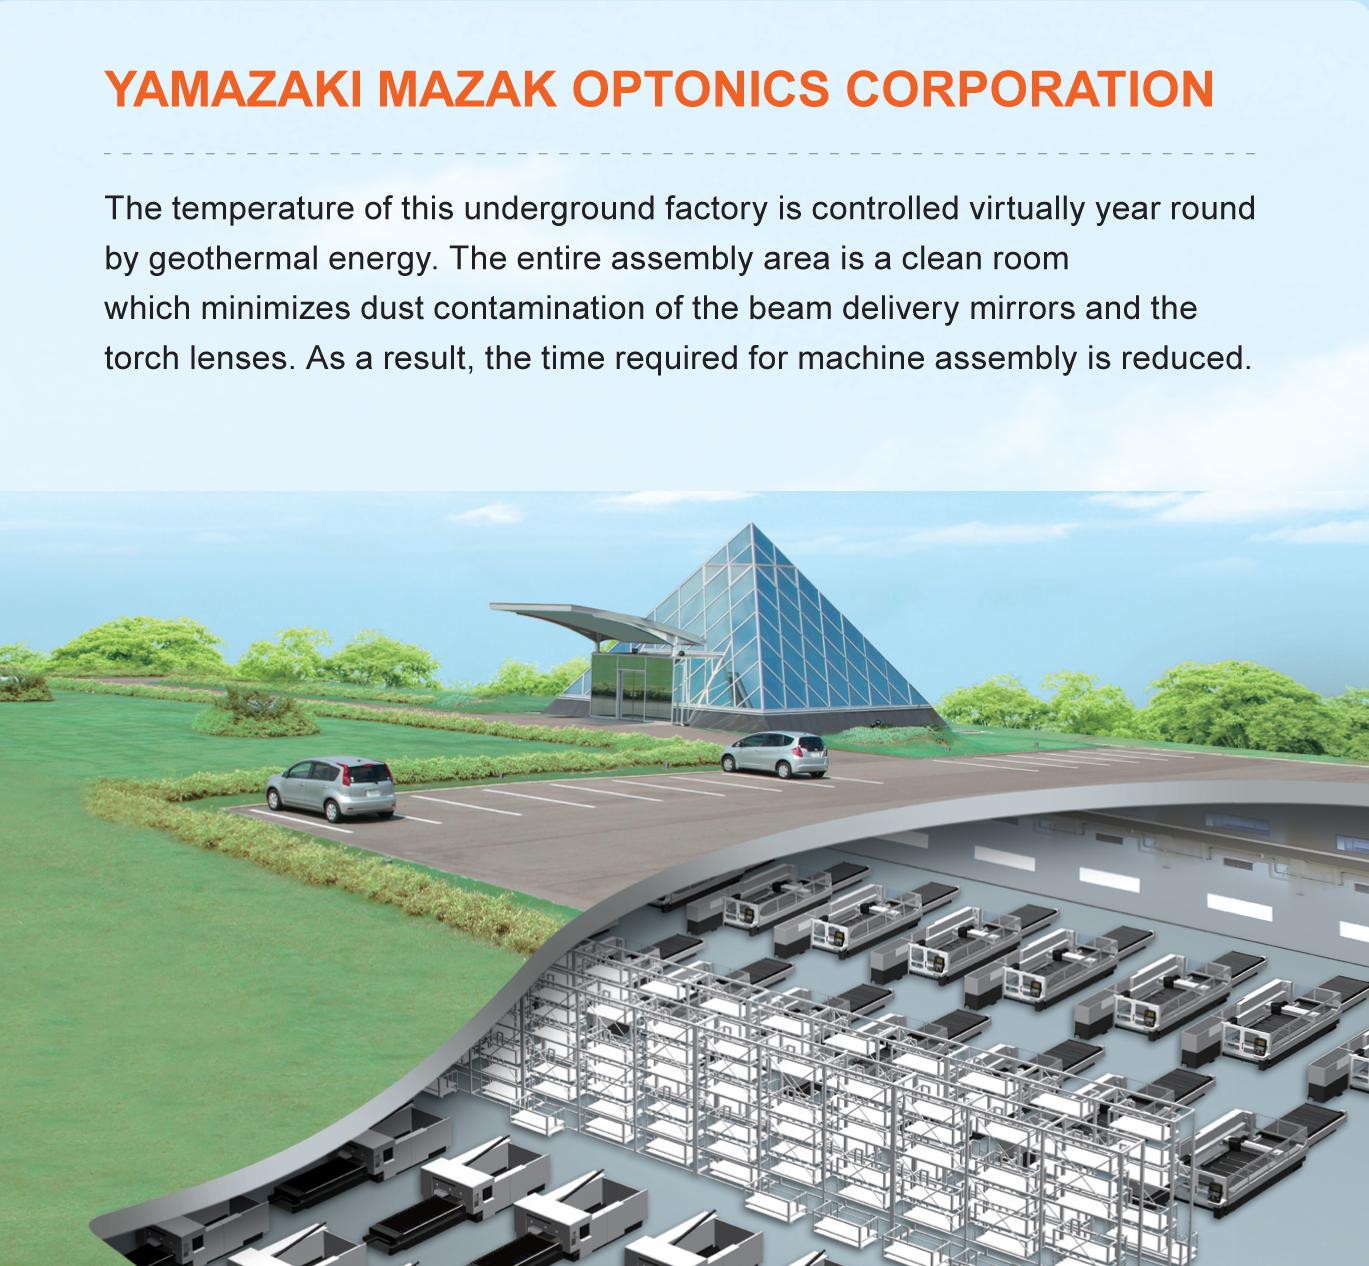 mazak optonics corporation